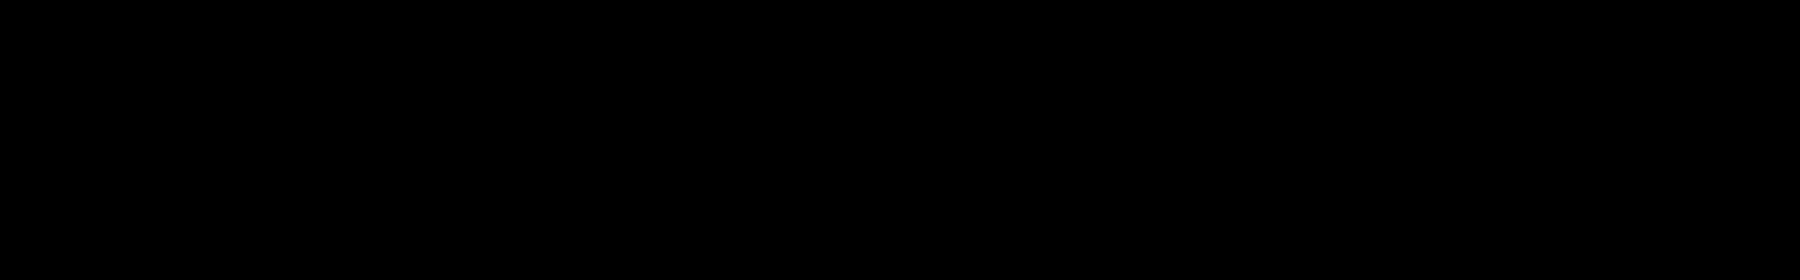 Nu-Disco Club: Ableton Live Template audio waveform